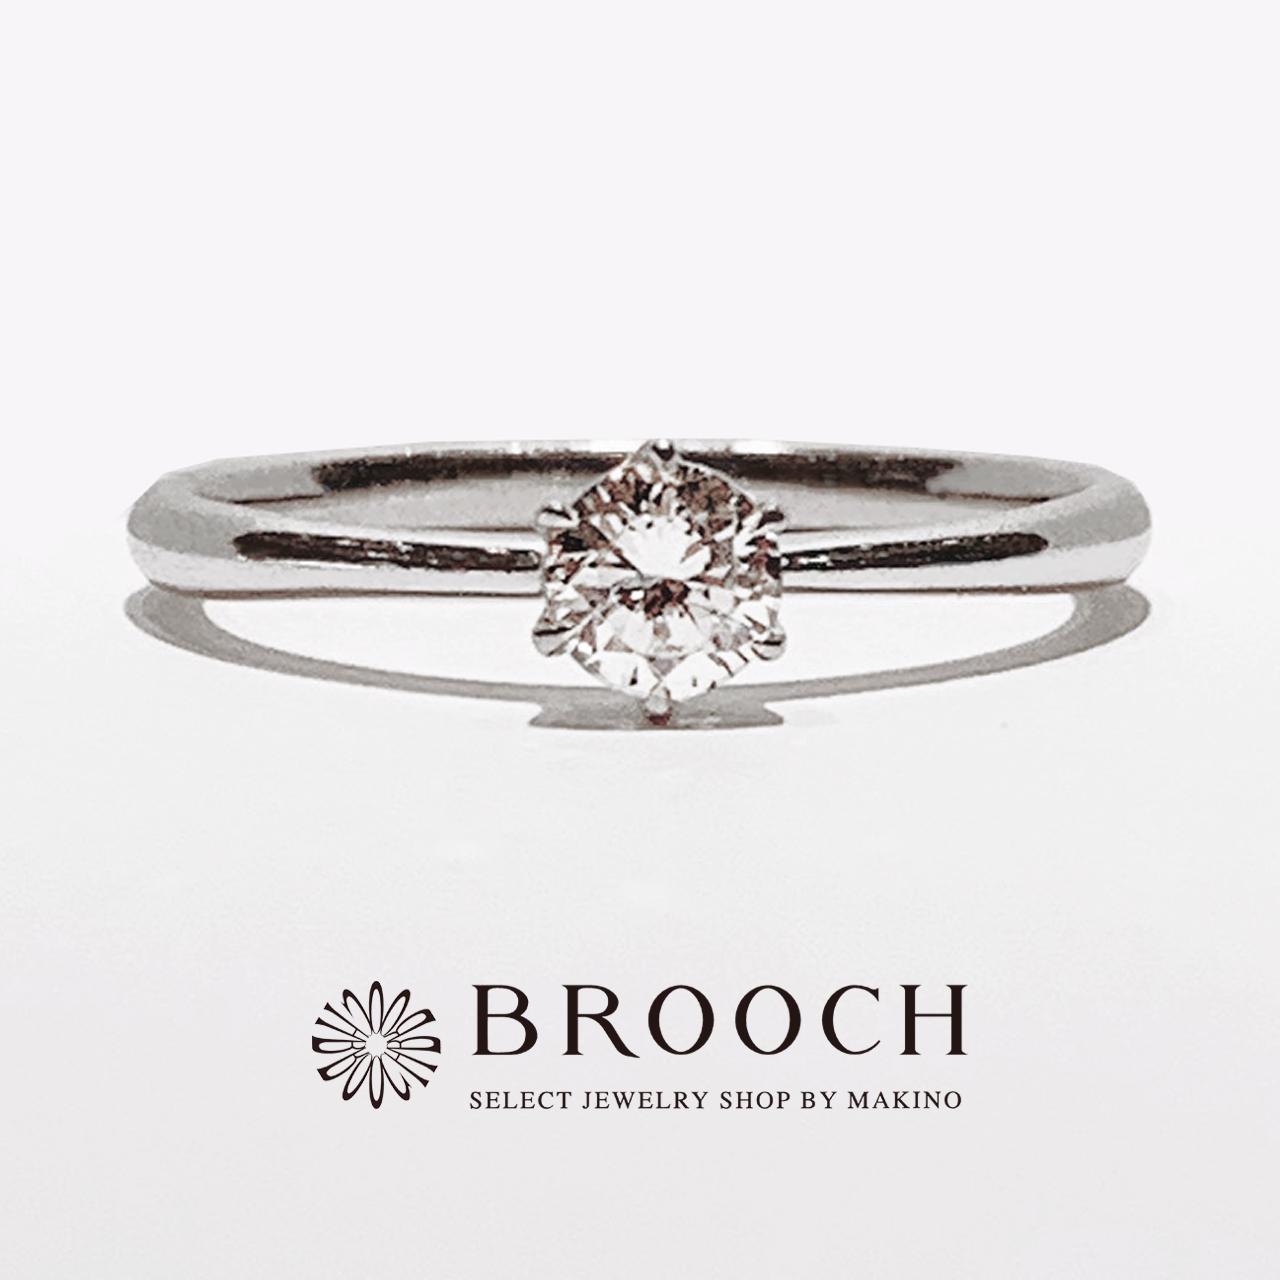 BROOCH 婚約指輪 エンゲージリング シンプル1石デザイン